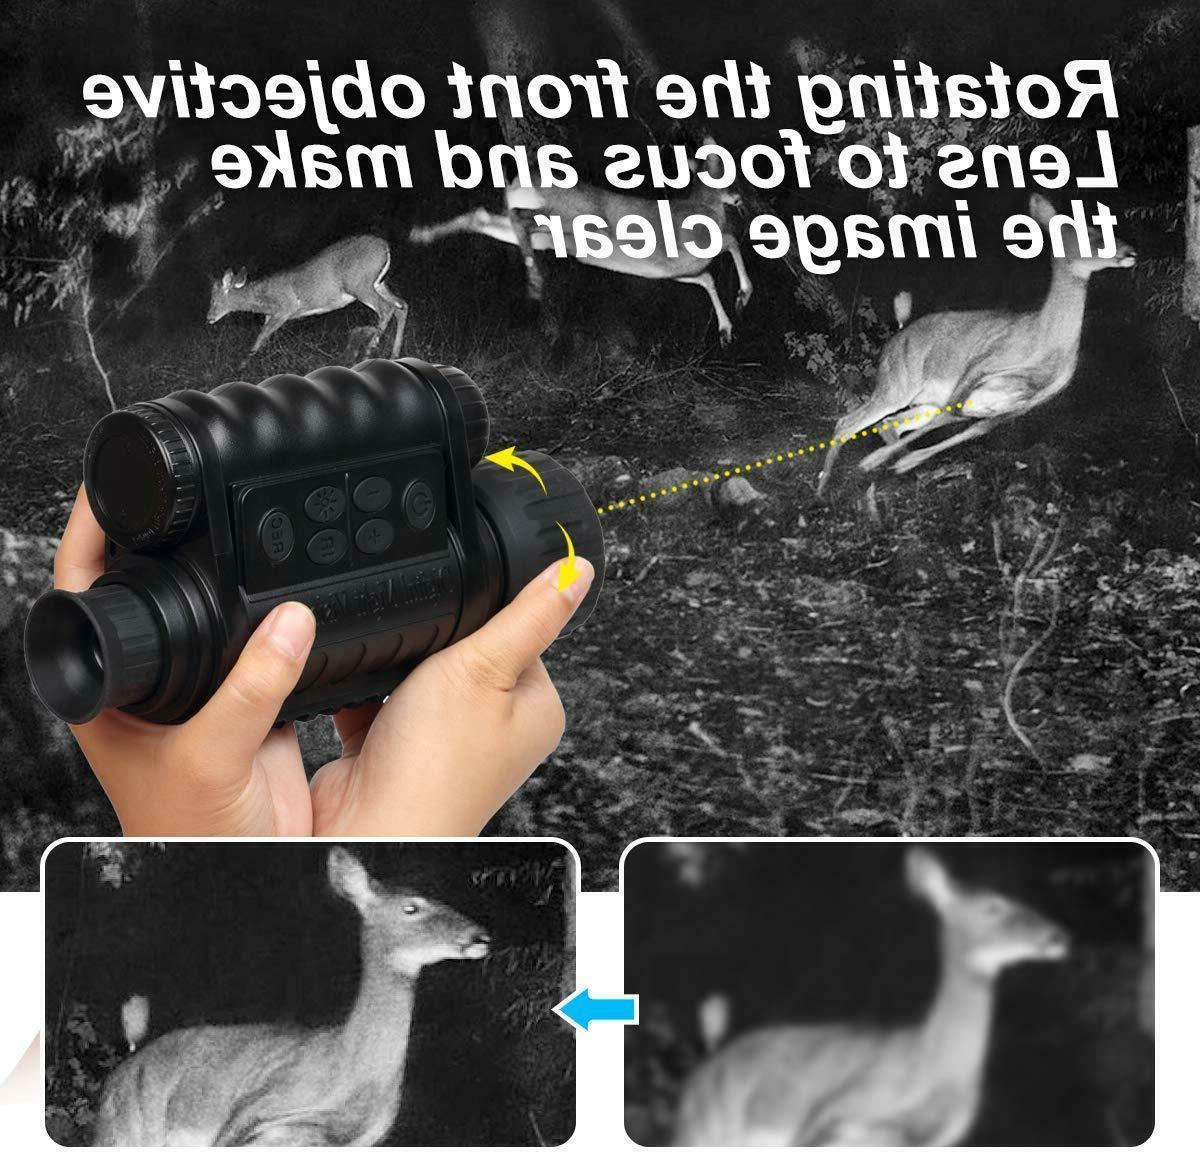 Infrared Night Monocular WiFi,Bestguarder Plus,6-30X50MM Sm